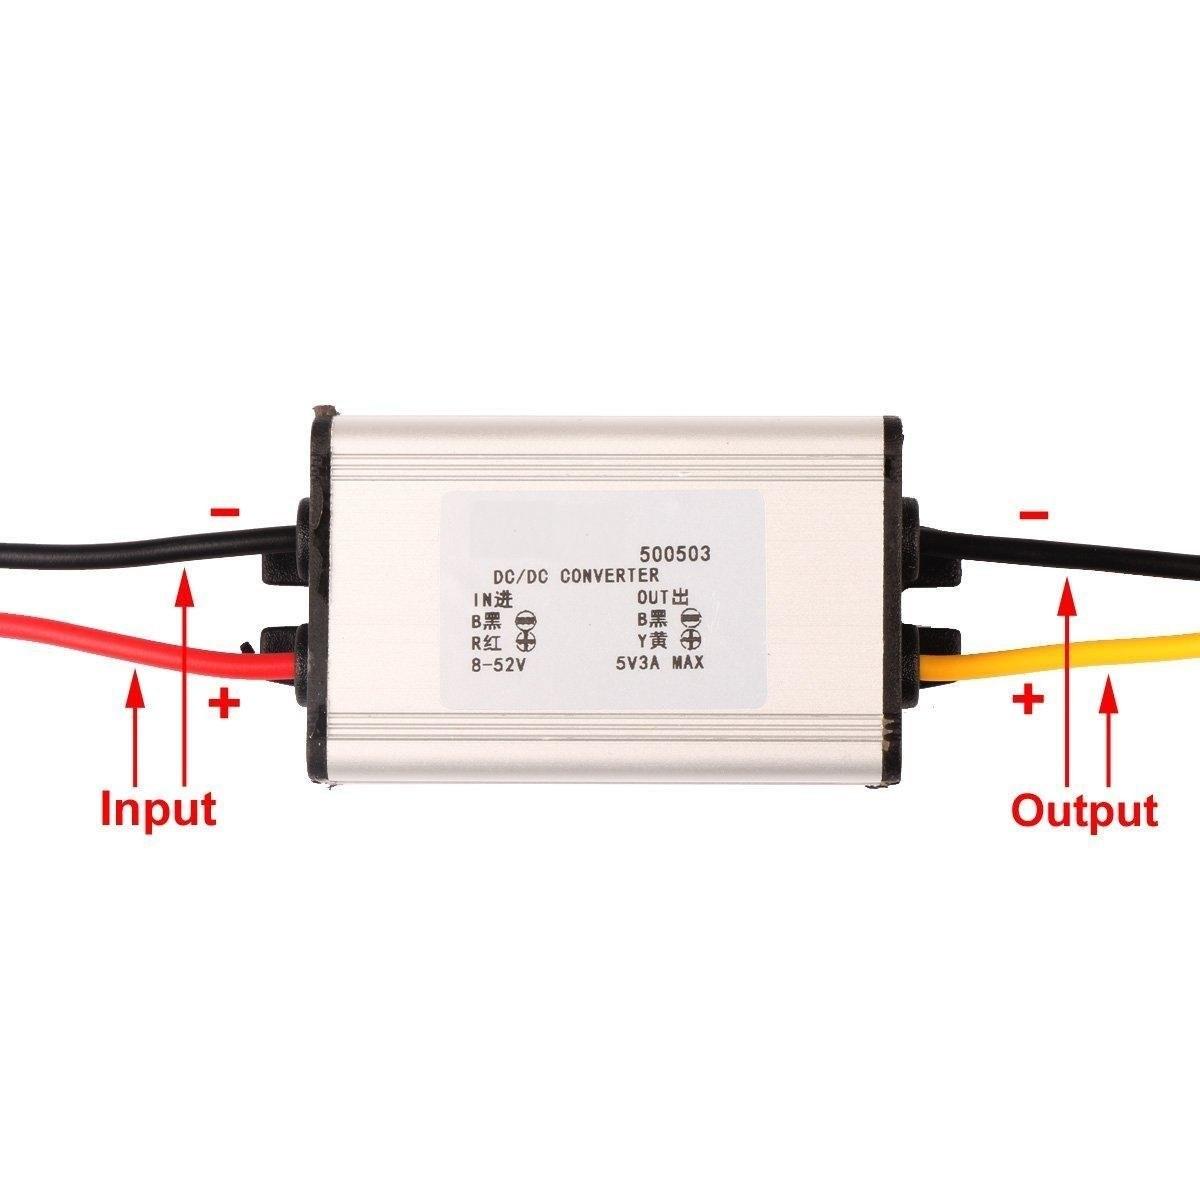 Riorand Dc To Volt Converter Module 8 52v 12v 24v 5v 3a Buck Circuit Lightbox Moreview